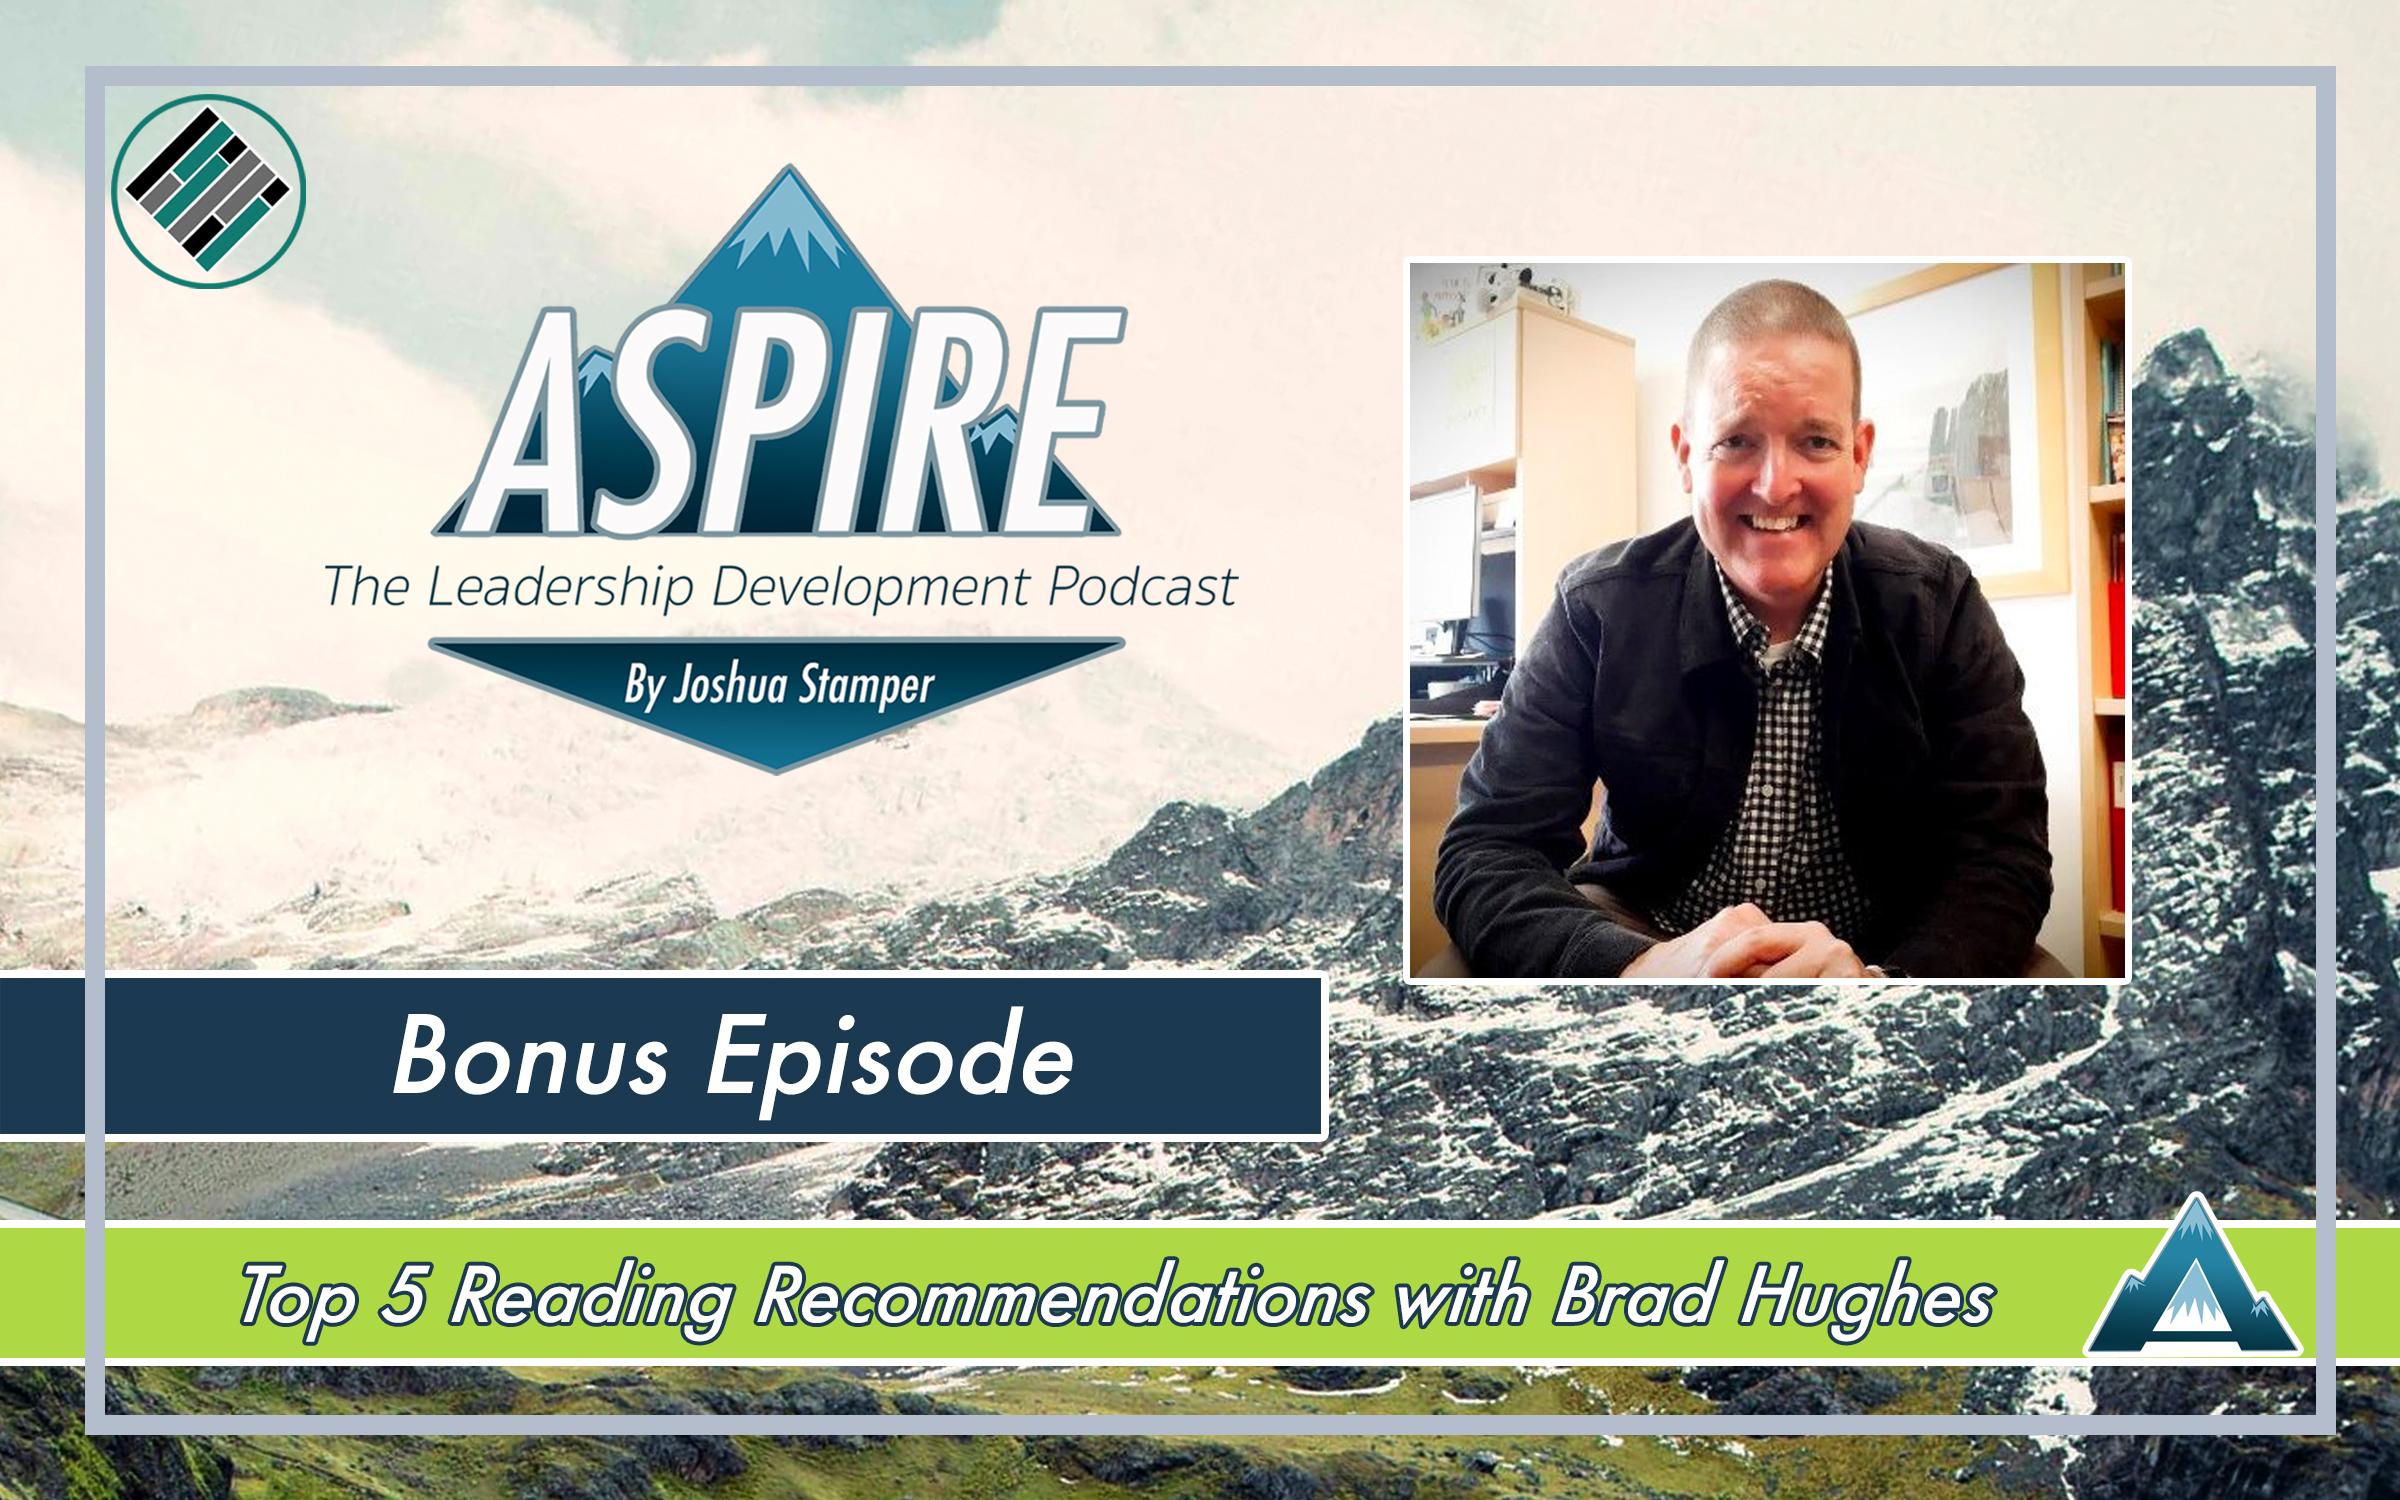 Joshua Stamper, Brad Hughes, Aspire: The Leadership Development Podcast